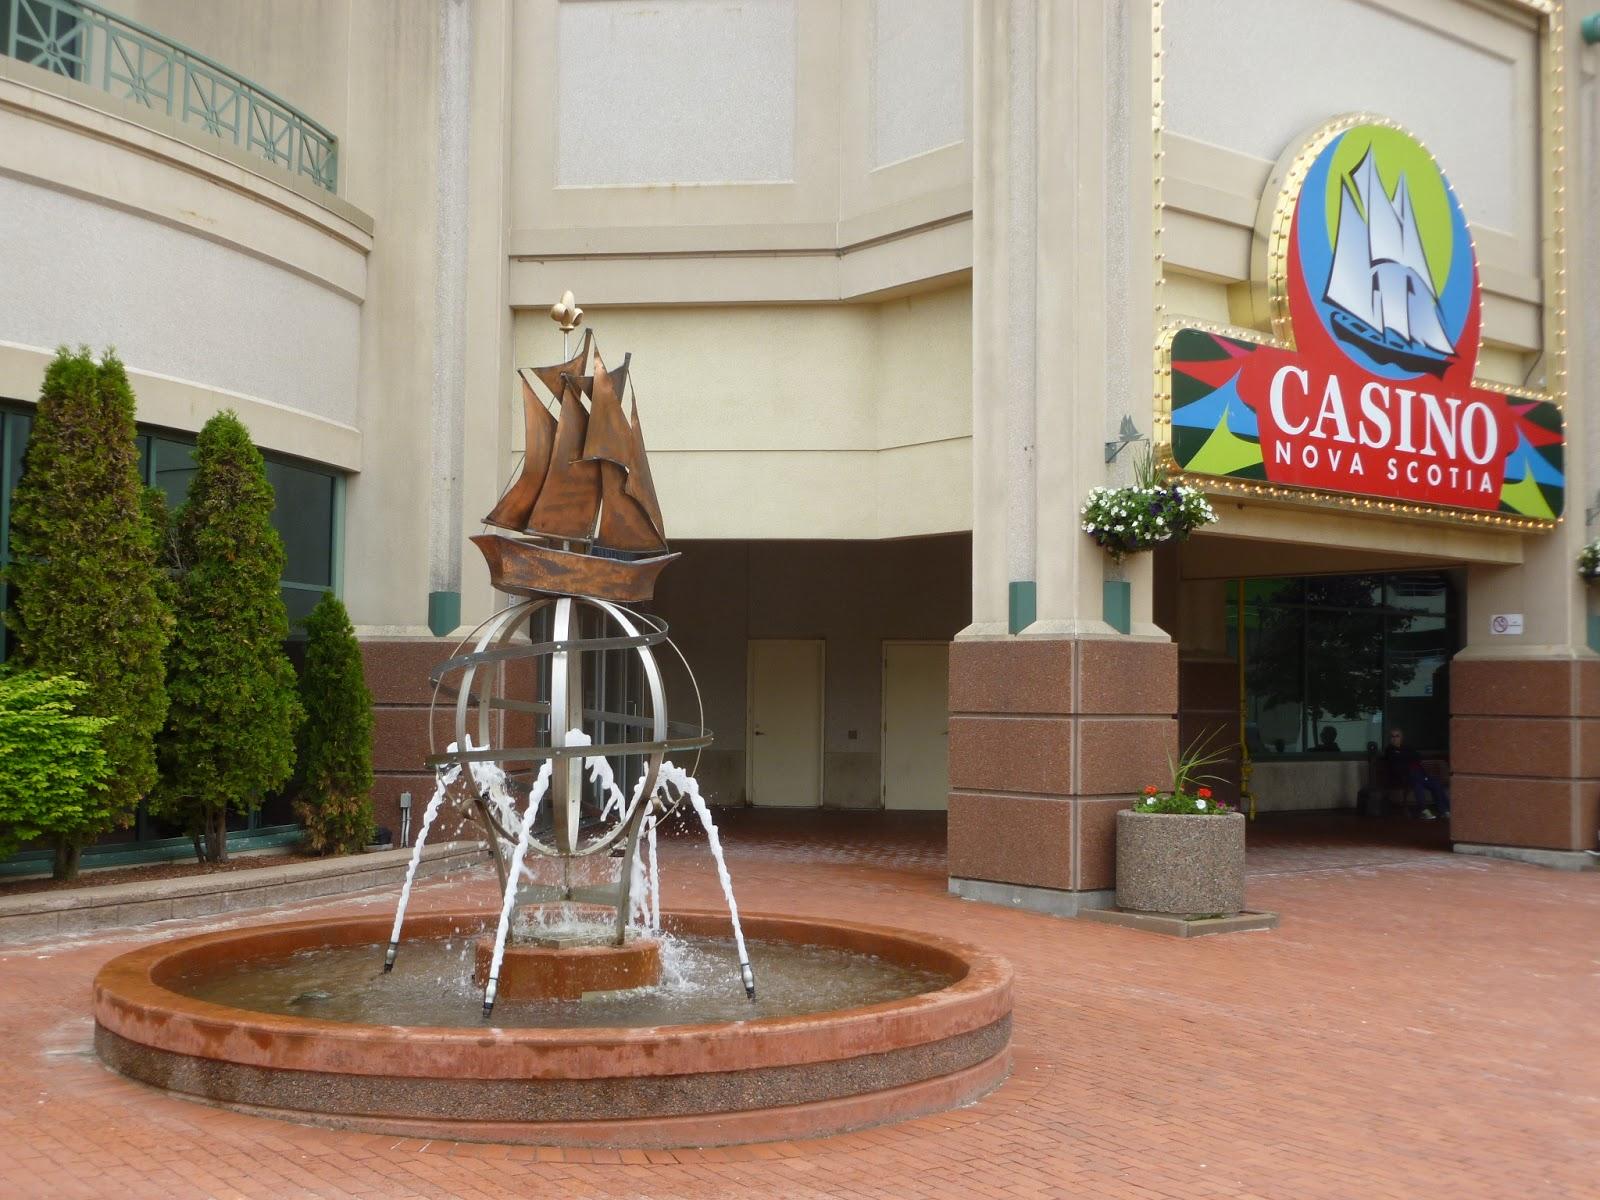 Casino Nova Scotia Halifax, Ns